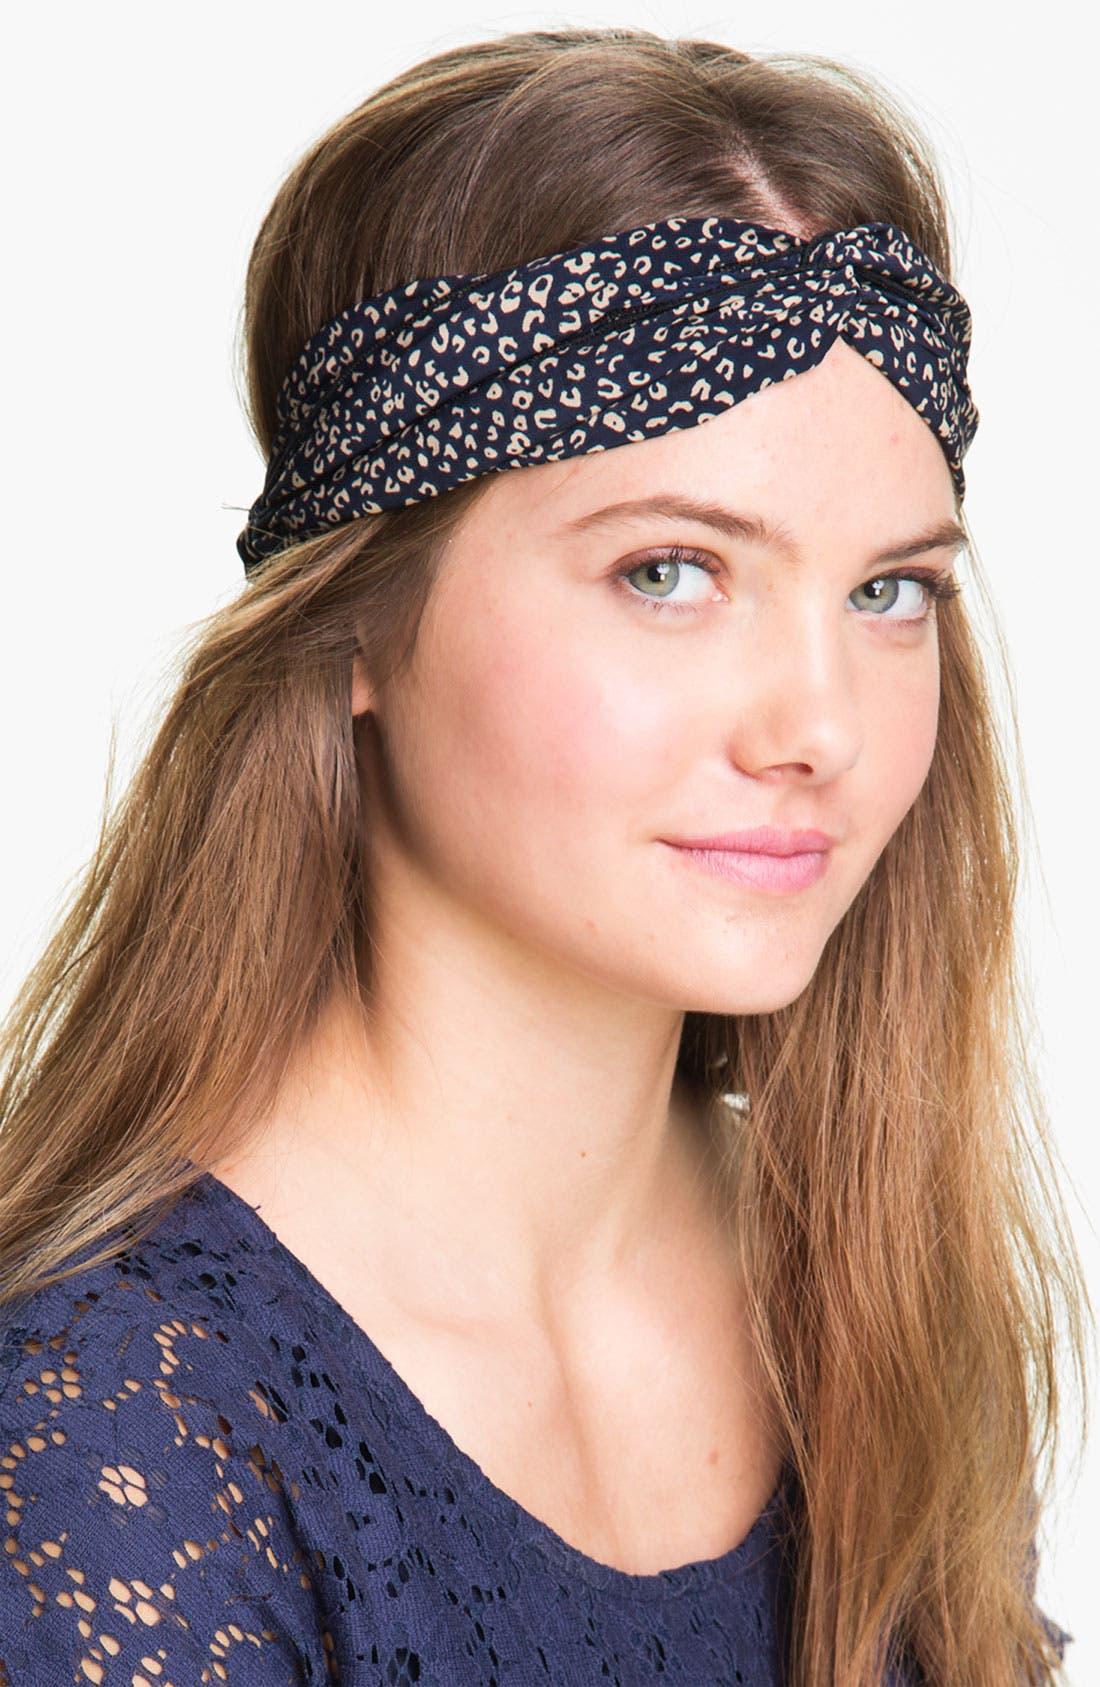 Alternate Image 1 Selected - Carole Print Twist Knot Headband